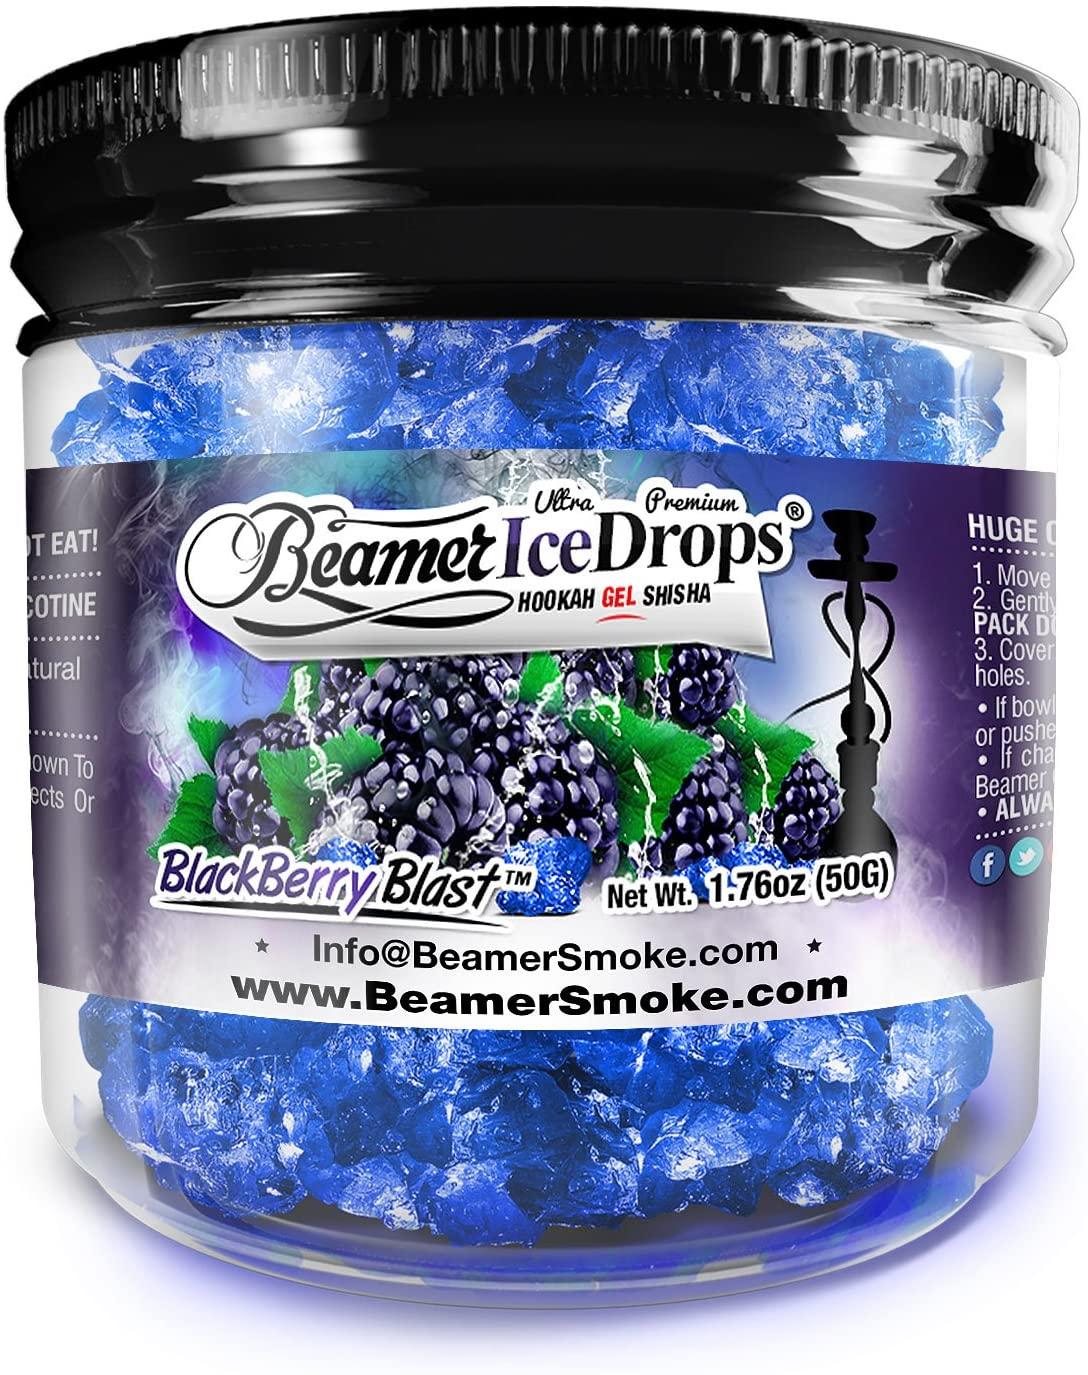 BlackBerry Blast 50G Ultra Premium Beamer Ice Drops Hookah Shisha Smoking Gel. Each Bowl Lasts 2-4 Hours! USA Made, Huge Clouds, Amazing Taste! Better Taste & Clouds Than Tobacco!